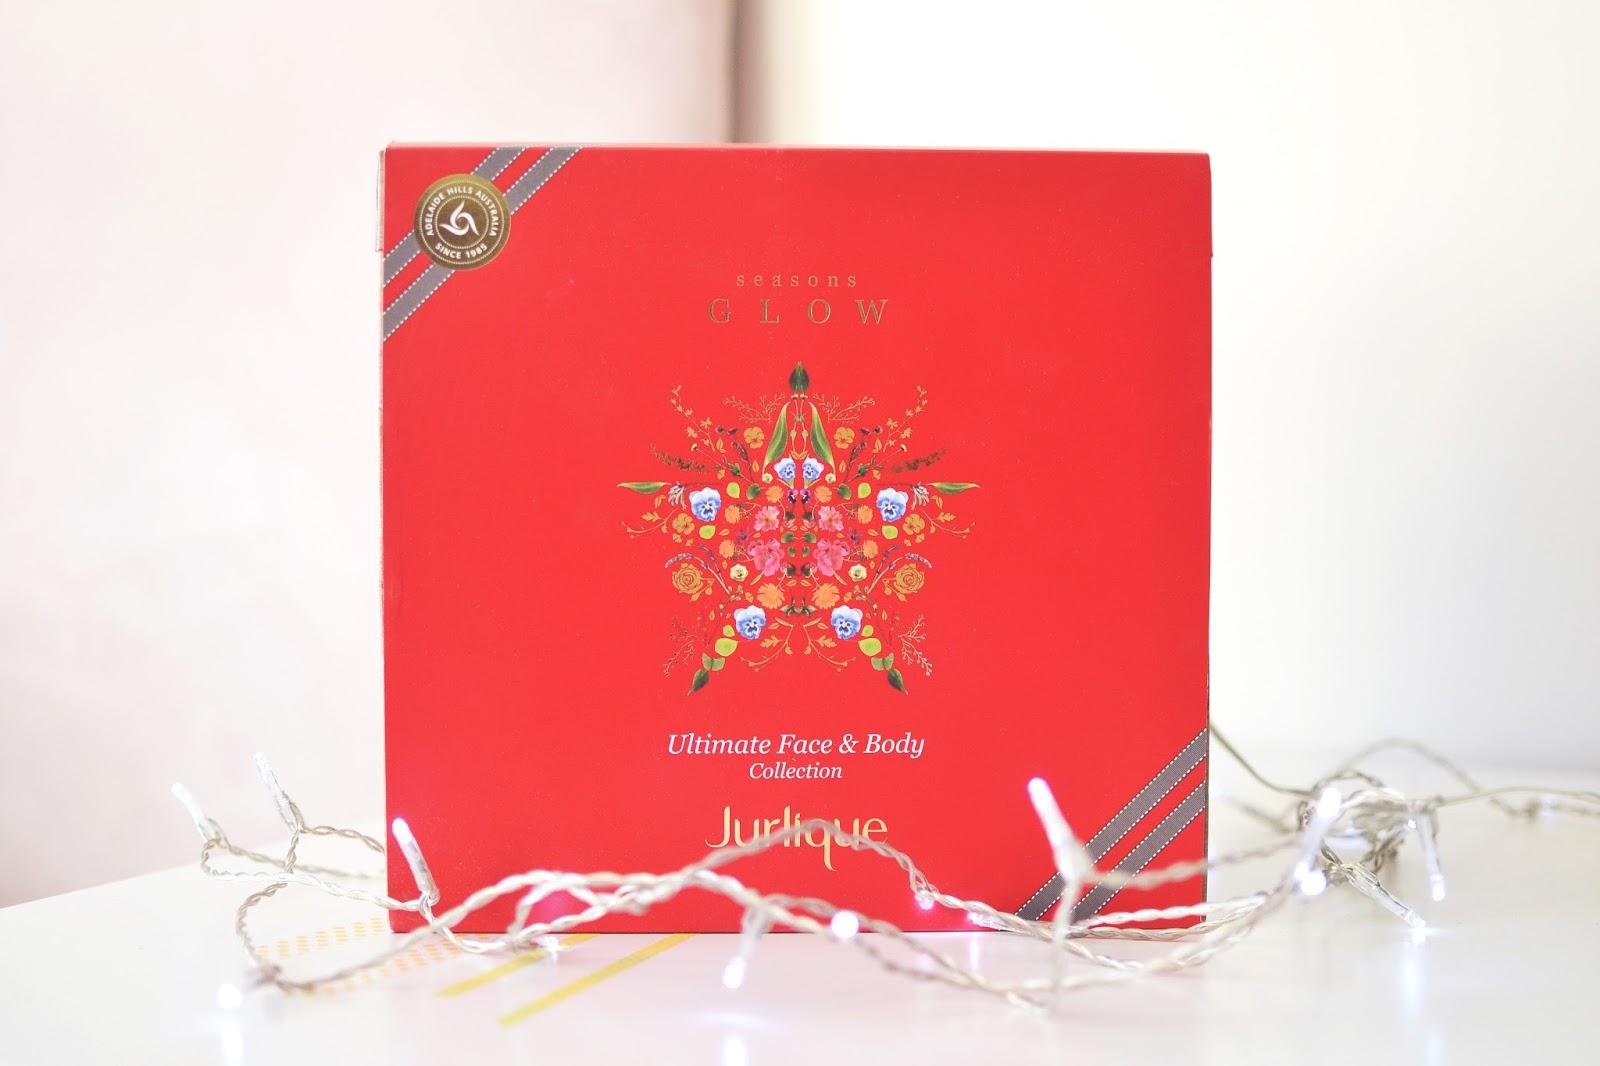 Jurlique Gift Sets, Jurlique review